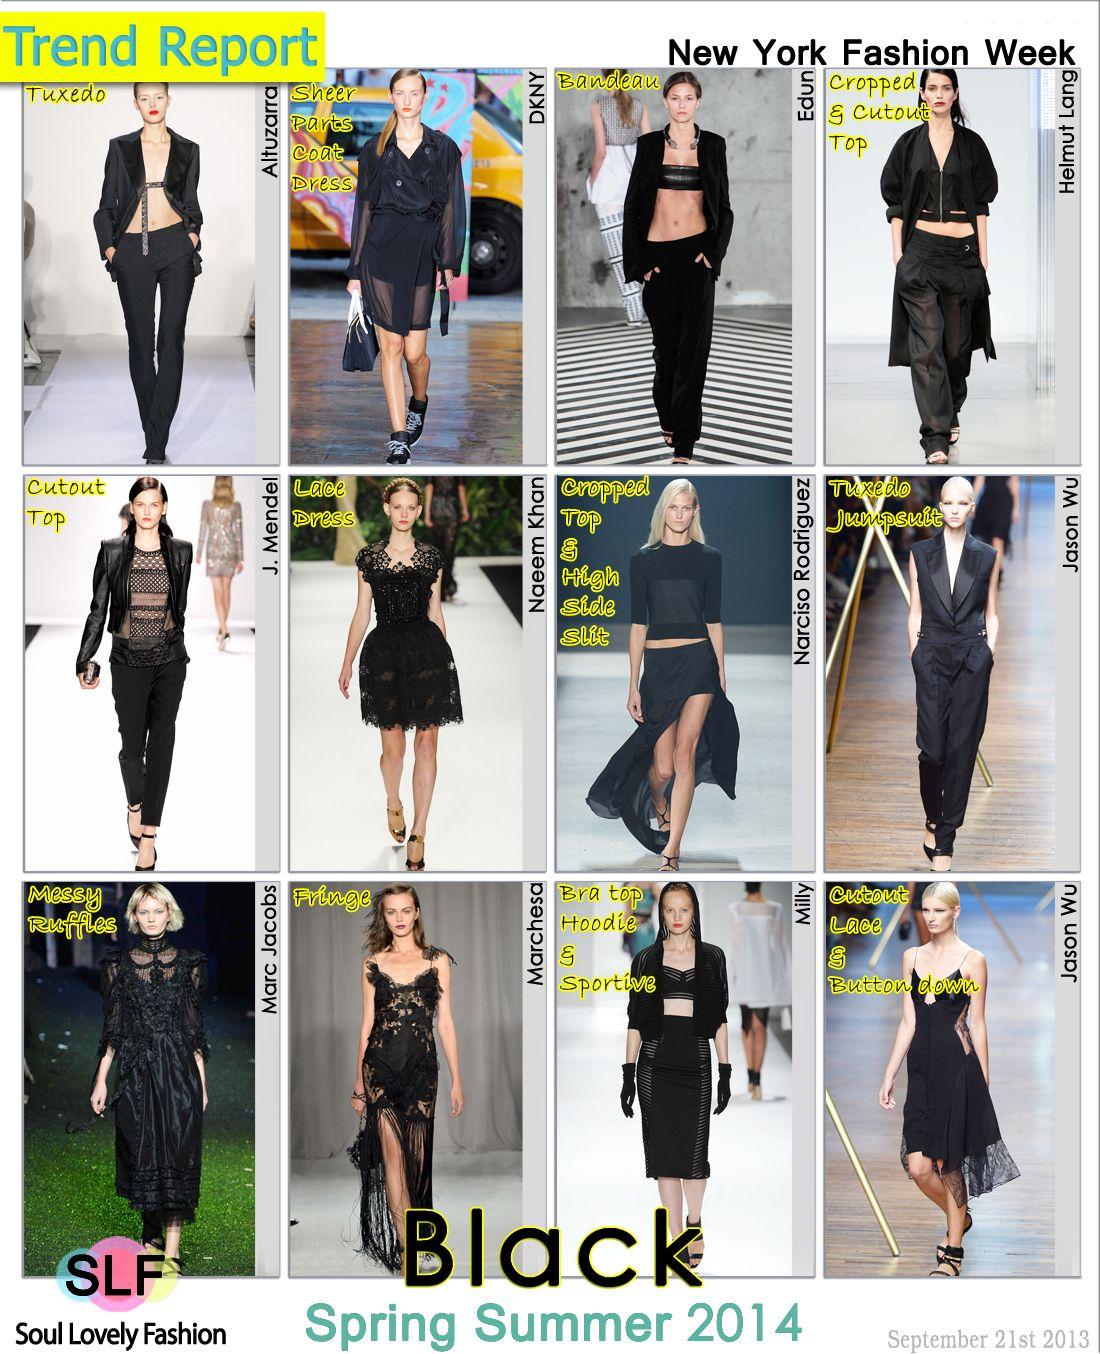 Black Color Fashion #Trend for Spring Summer 2014 at New York #Fashion Week #NYFW #Spring2014 #black #Colors #Trends